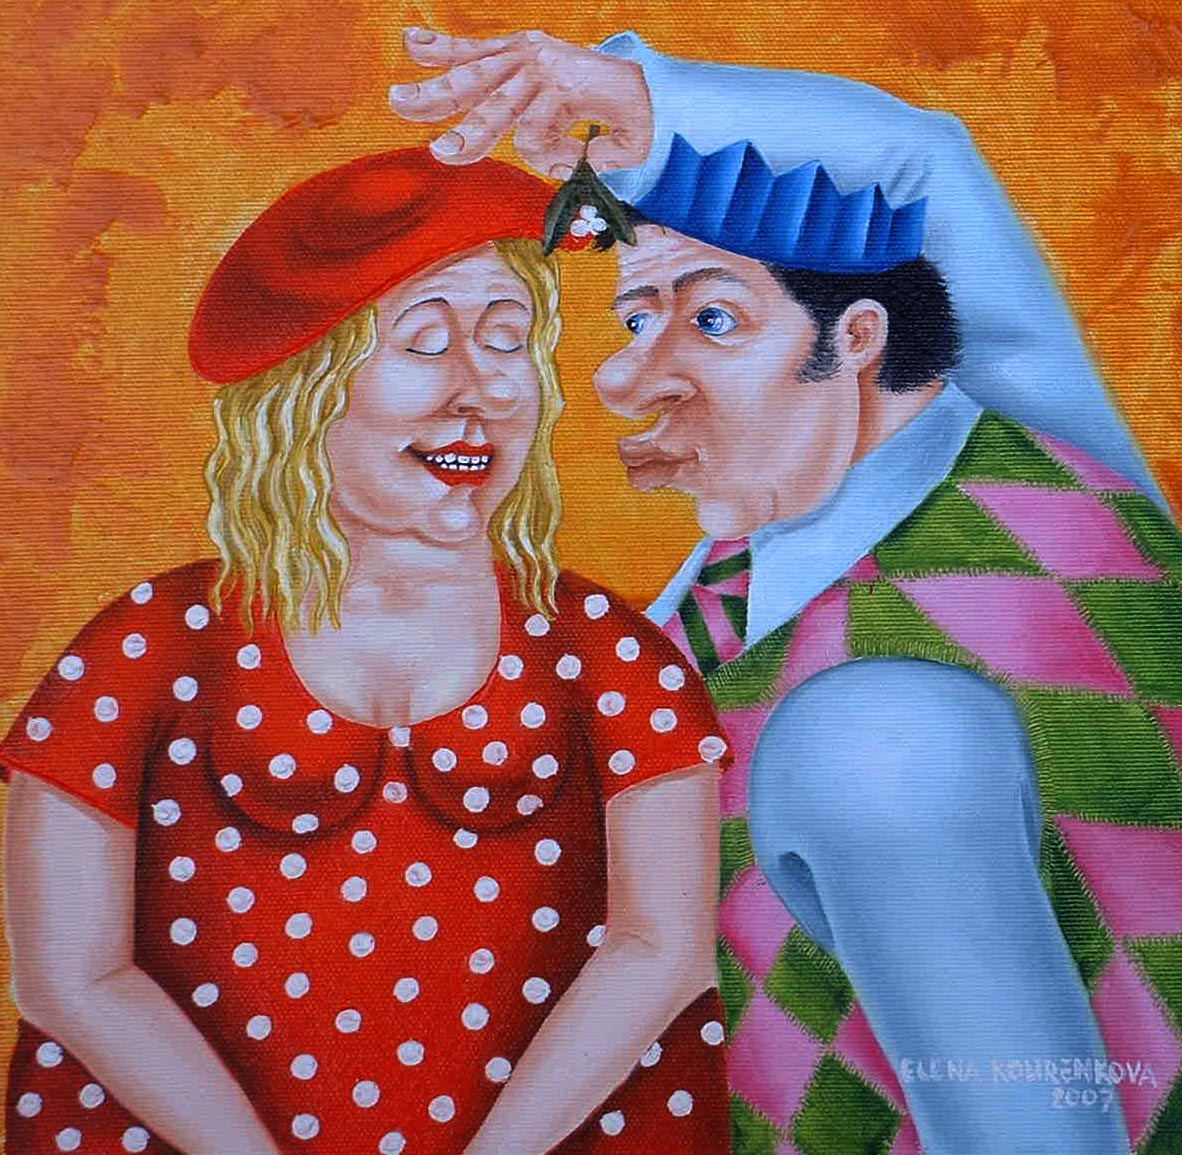 xmas romantic kiss under mistleto